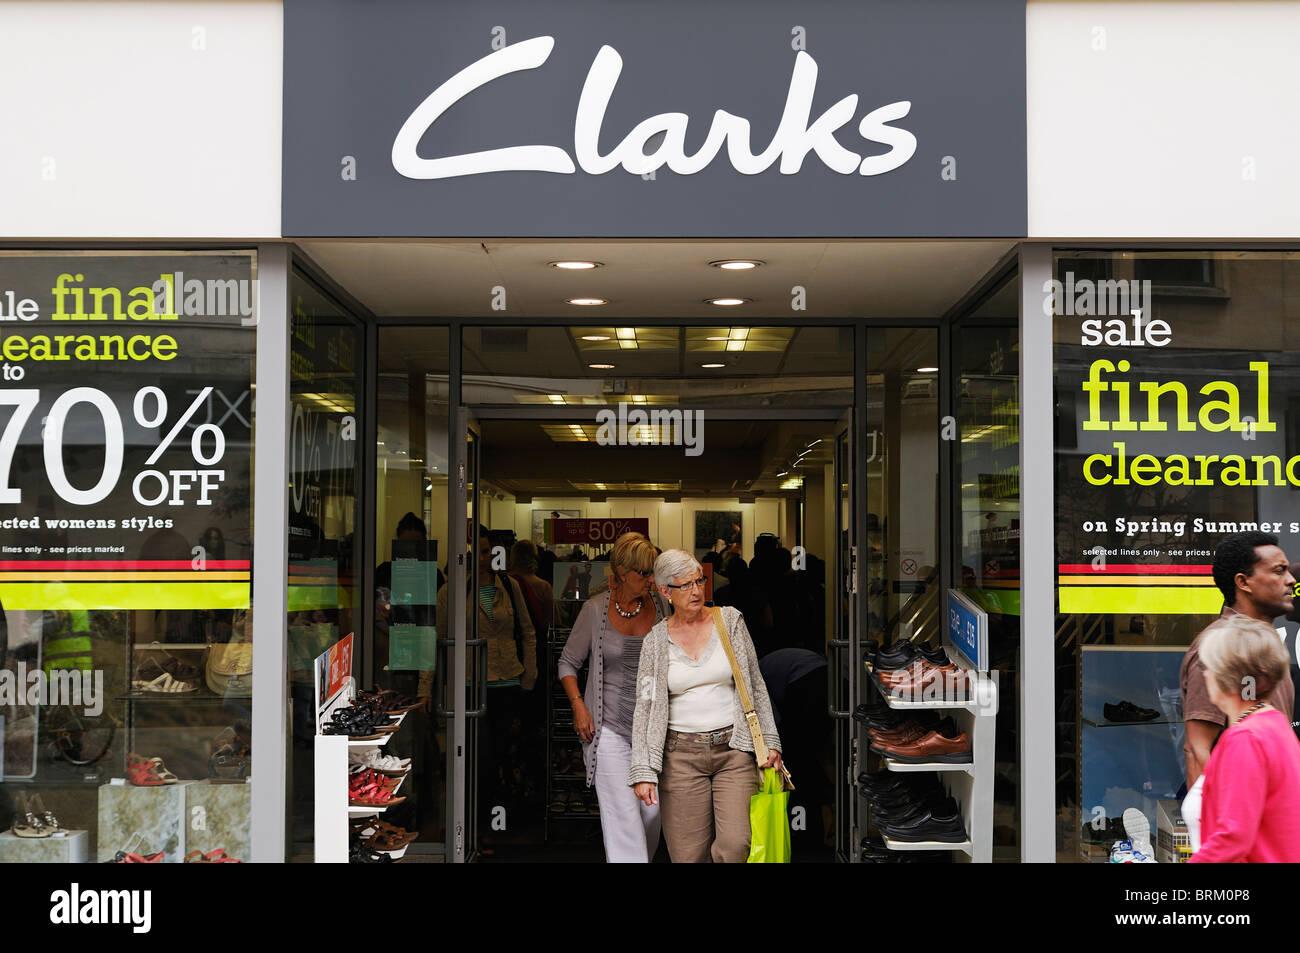 Clarks Shoe Shop, Oxford, UK. - Stock Image